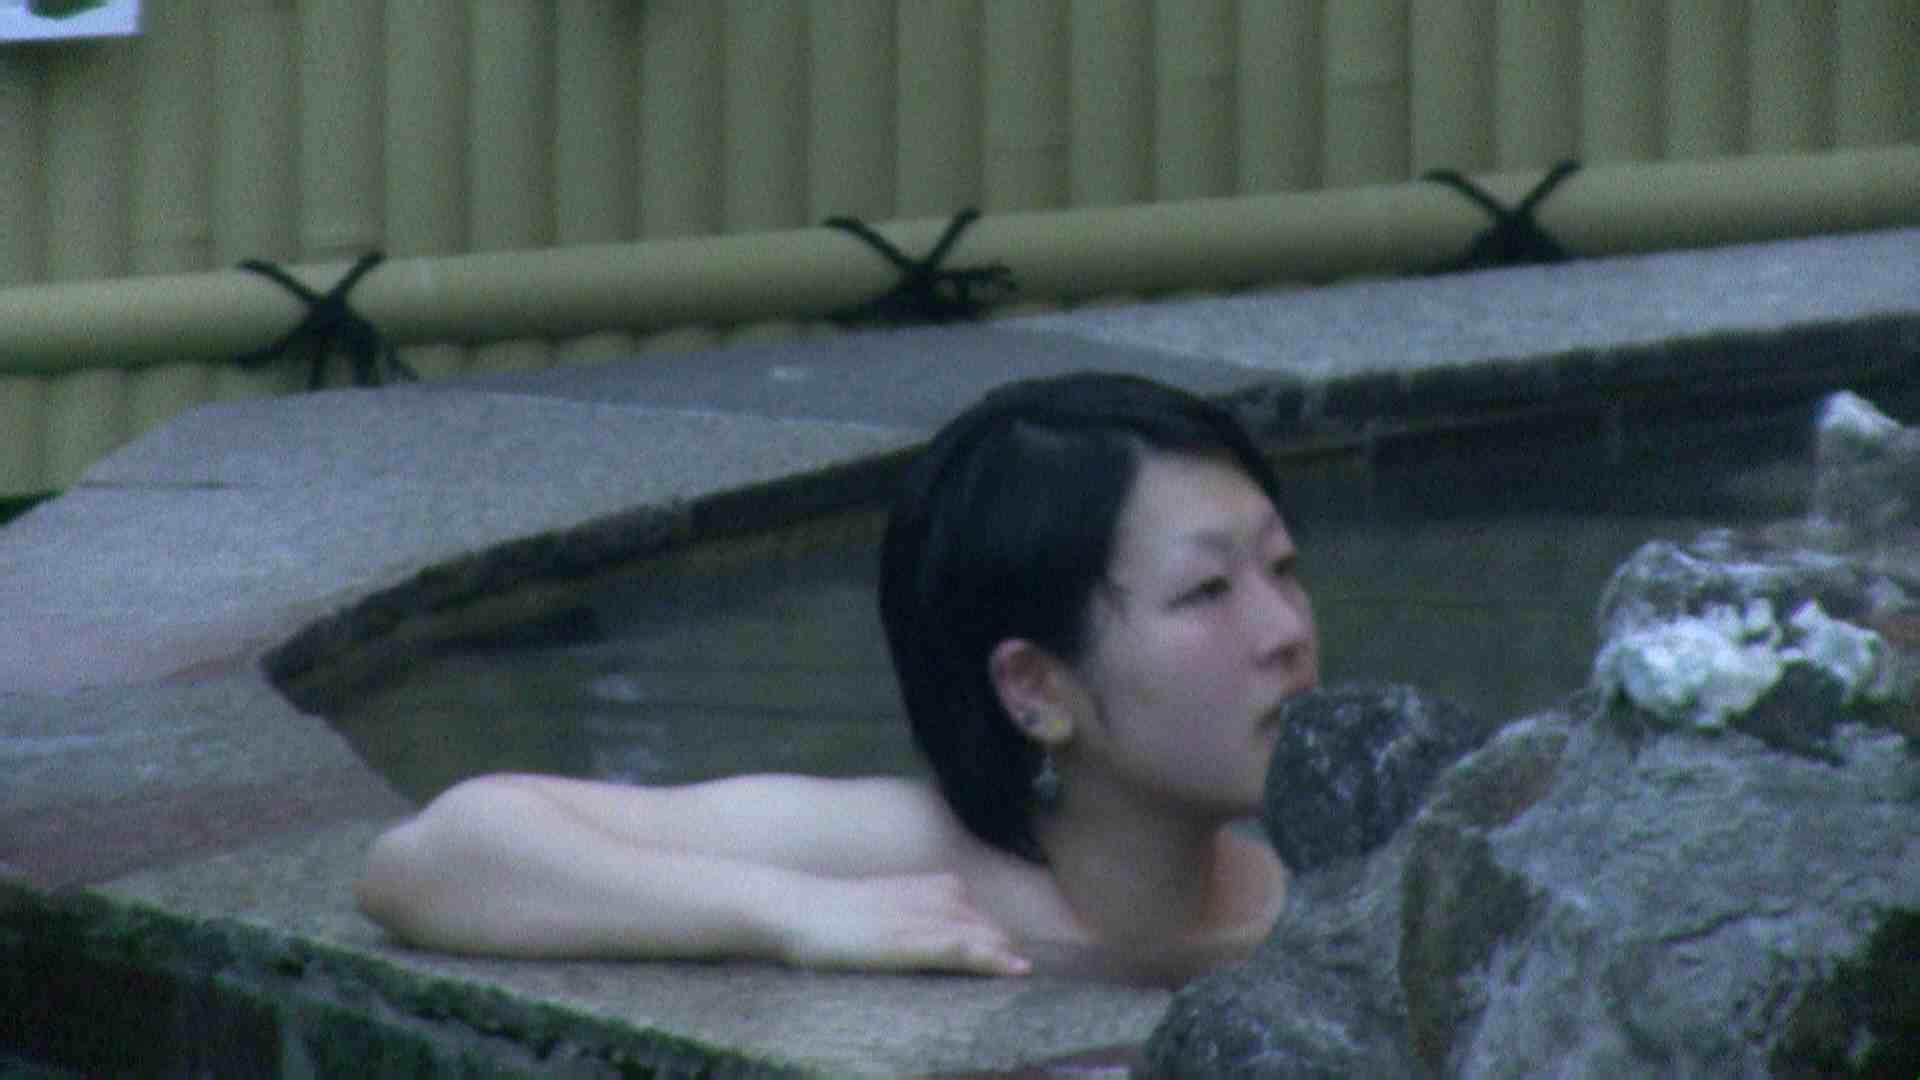 Aquaな露天風呂Vol.05【VIP】 OLのプライベート オメコ無修正動画無料 13pic 11